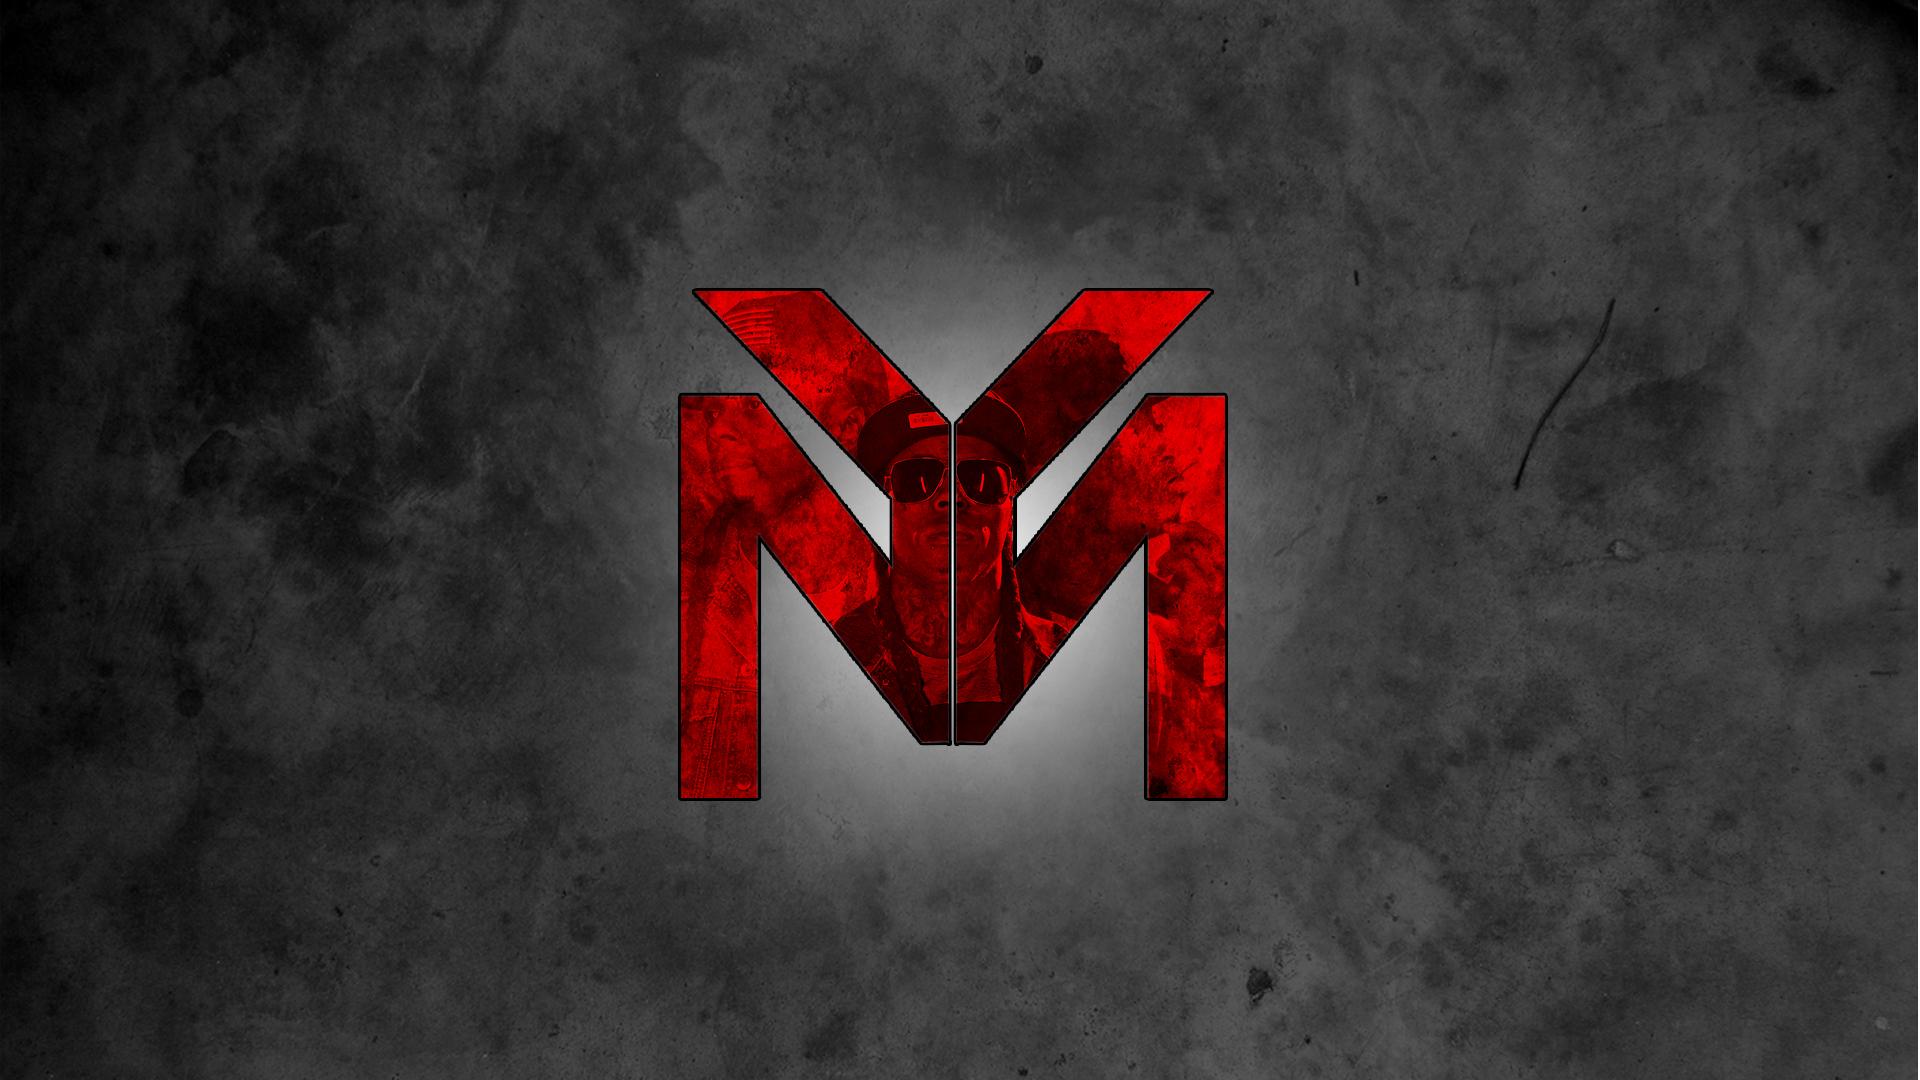 Lil Wayne YMCMB by SBM...